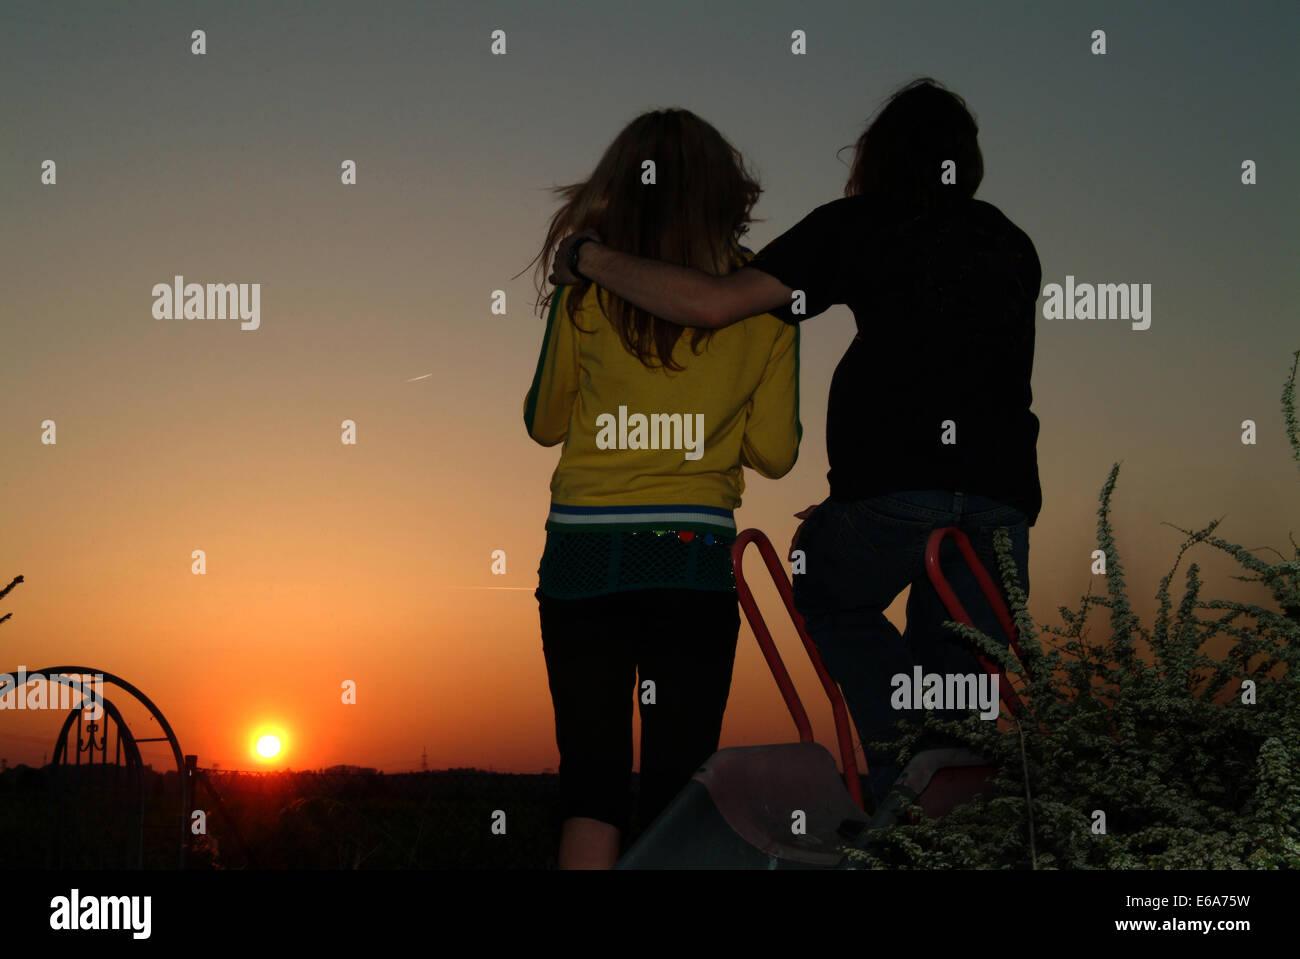 teenager,sunset,romantic,love couple - Stock Image